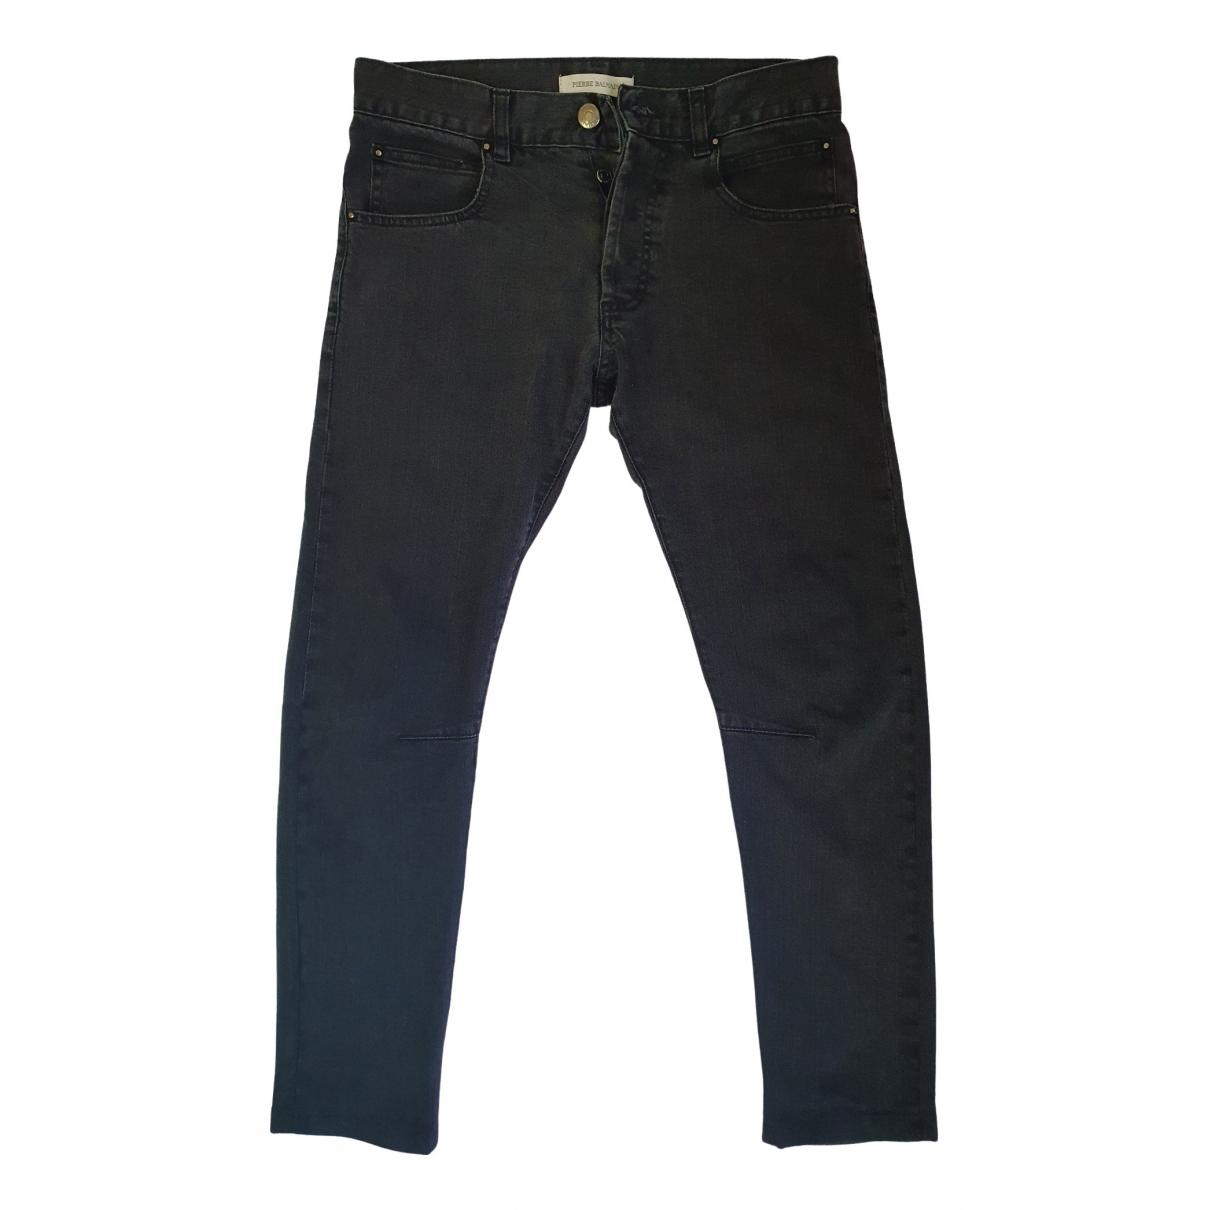 Pierre Balmain \N Anthracite Cotton - elasthane Jeans for Men 31 US